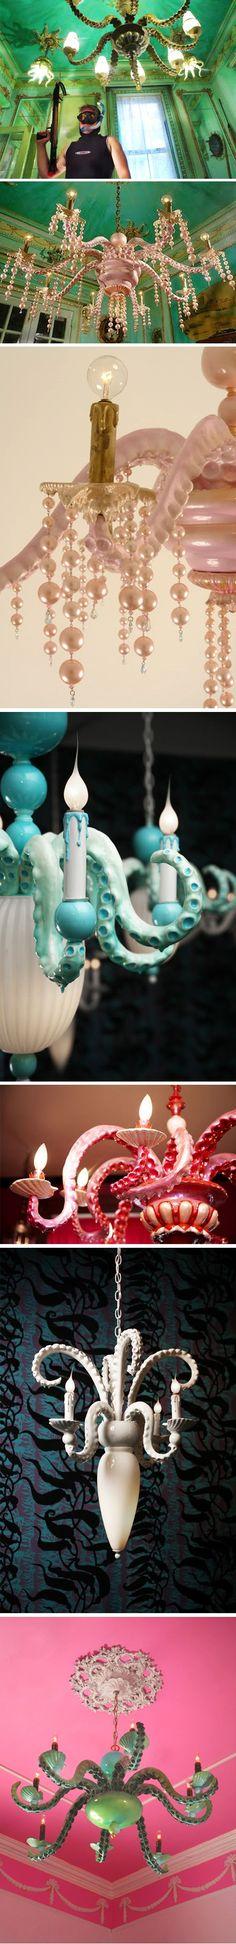 Tentacle chandeliers